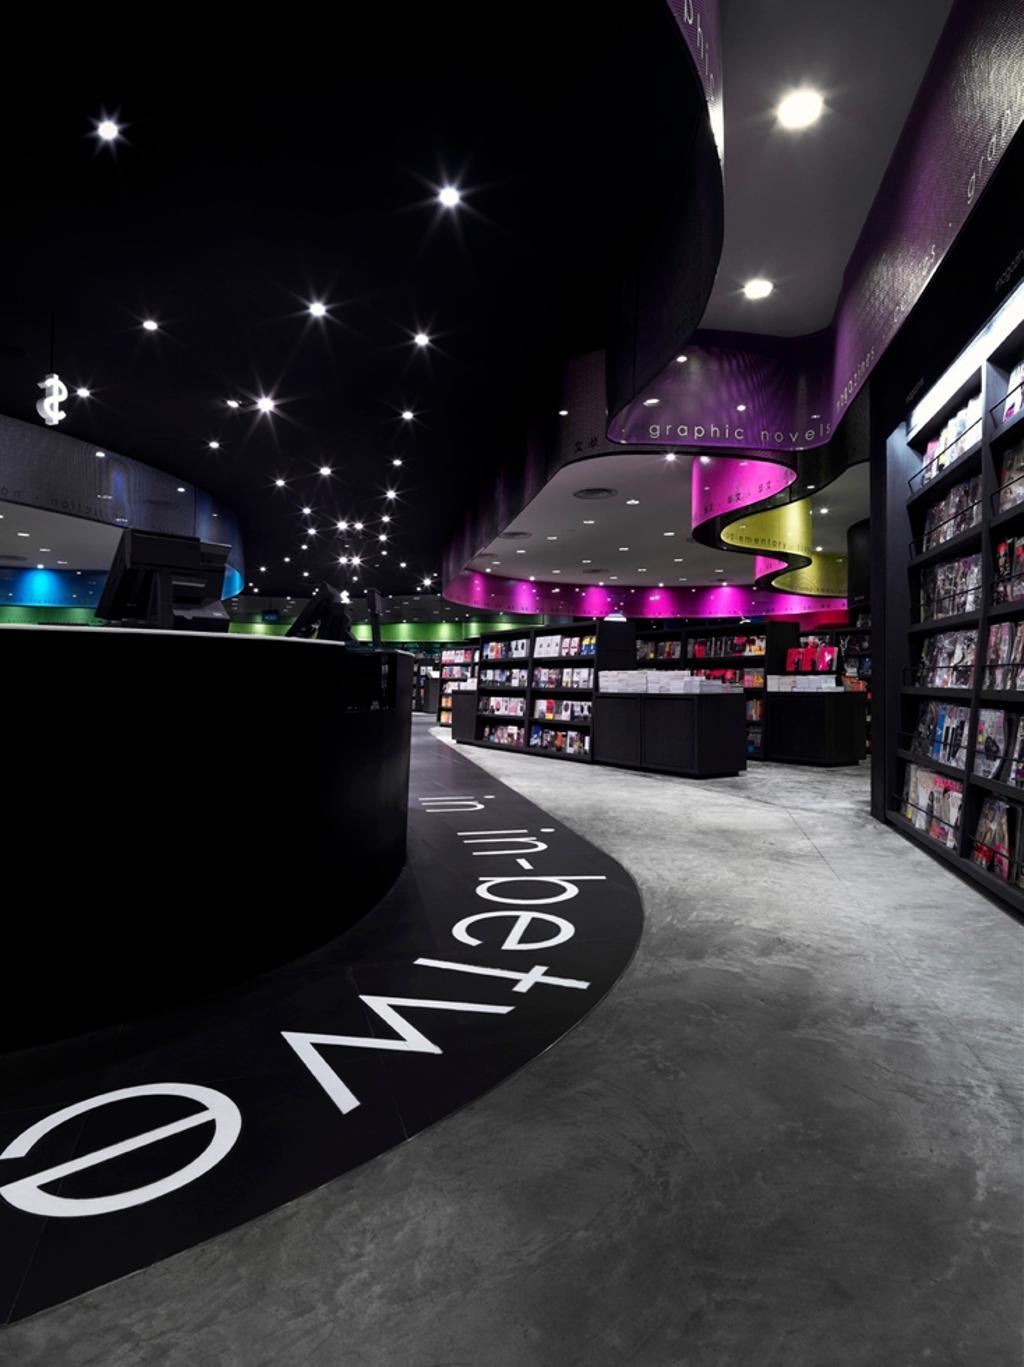 Prologue, Commercial, Architect, Ministry of Design, Modern, Concrete Floor, Black Shelves, Bookshelves, Recessed Lighting, Black Ceiling, False Ceiling, Shop